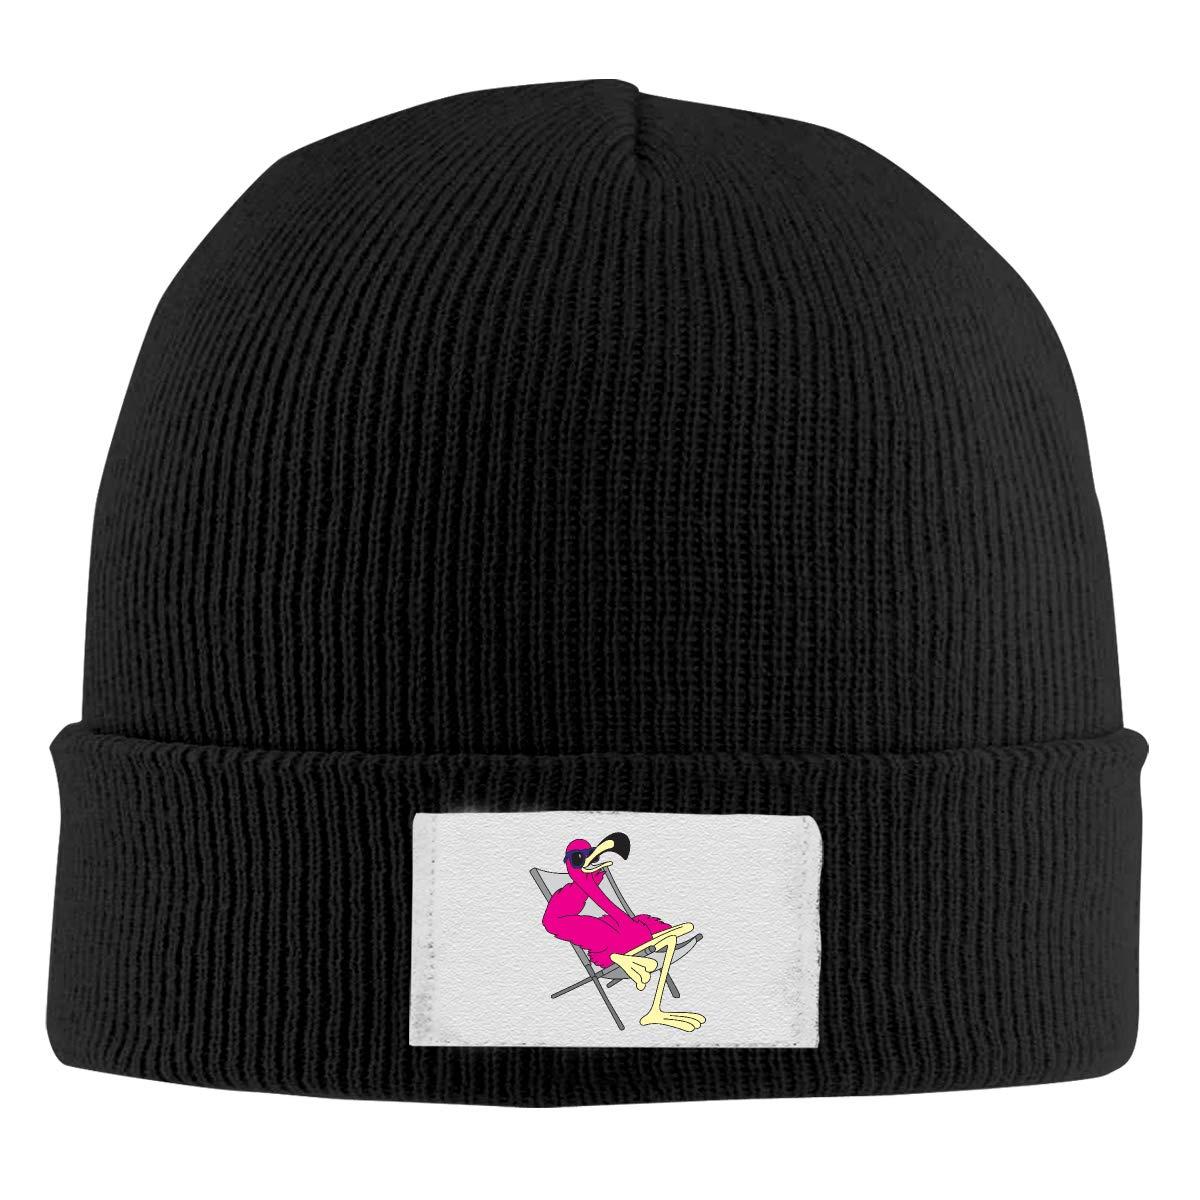 Stretchy Cuff Beanie Hat Black Skull Caps Funny Flamingo 1 Winter Warm Knit Hats